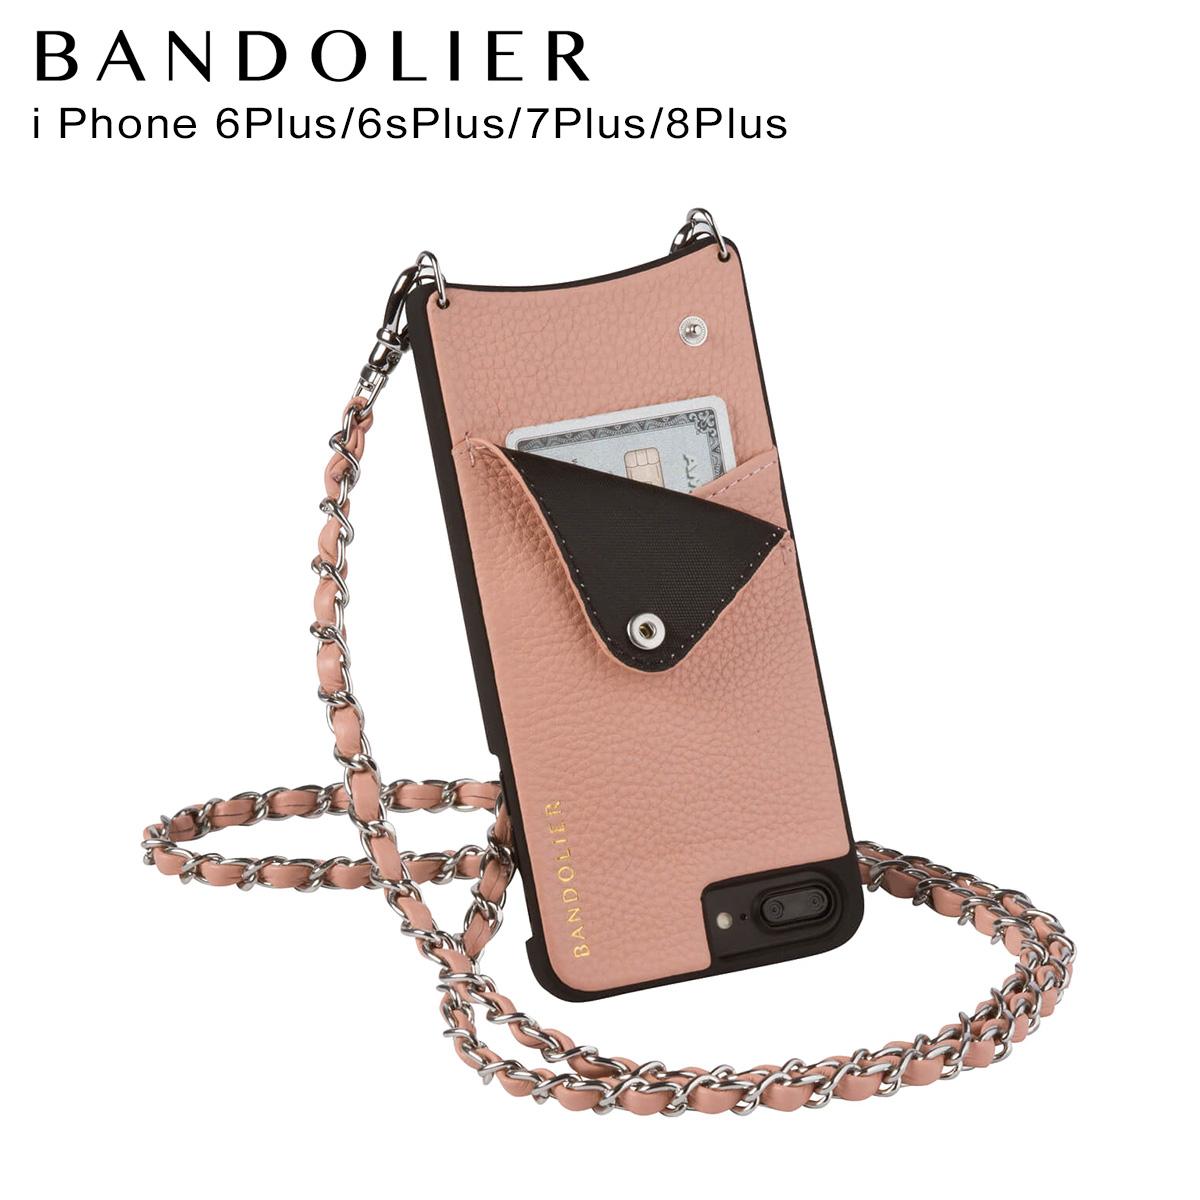 BANDOLIER iPhone8Plus iPhone7Plus 6sPlus LUCY BLUSH バンドリヤー ケース スマホ アイフォン プラス メンズ レディース